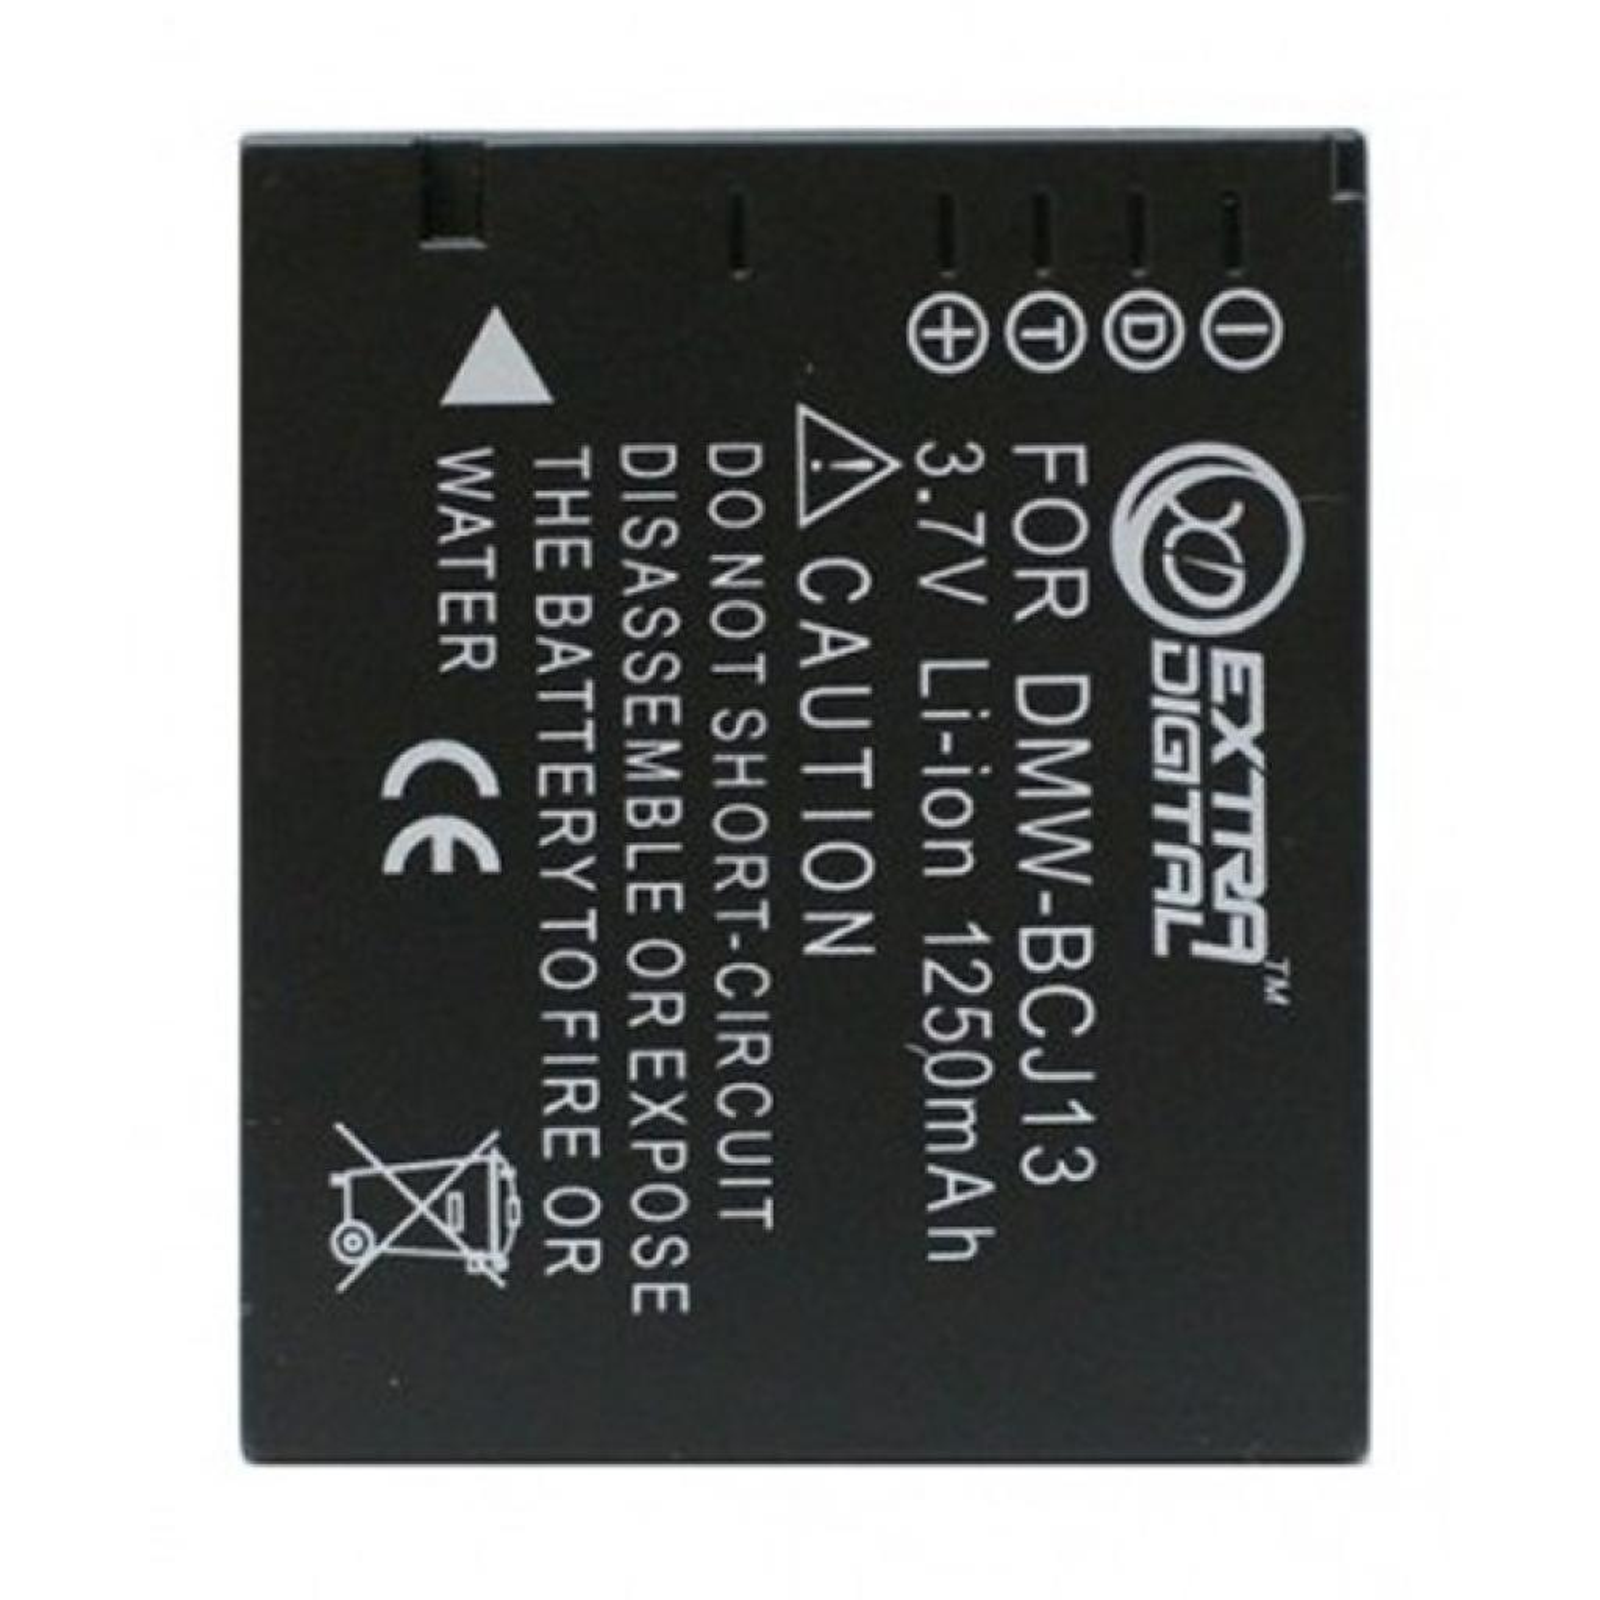 Аккумулятор к фото/видео EXTRADIGITAL Panasonic DMW-BCJ13 (BDP2560)